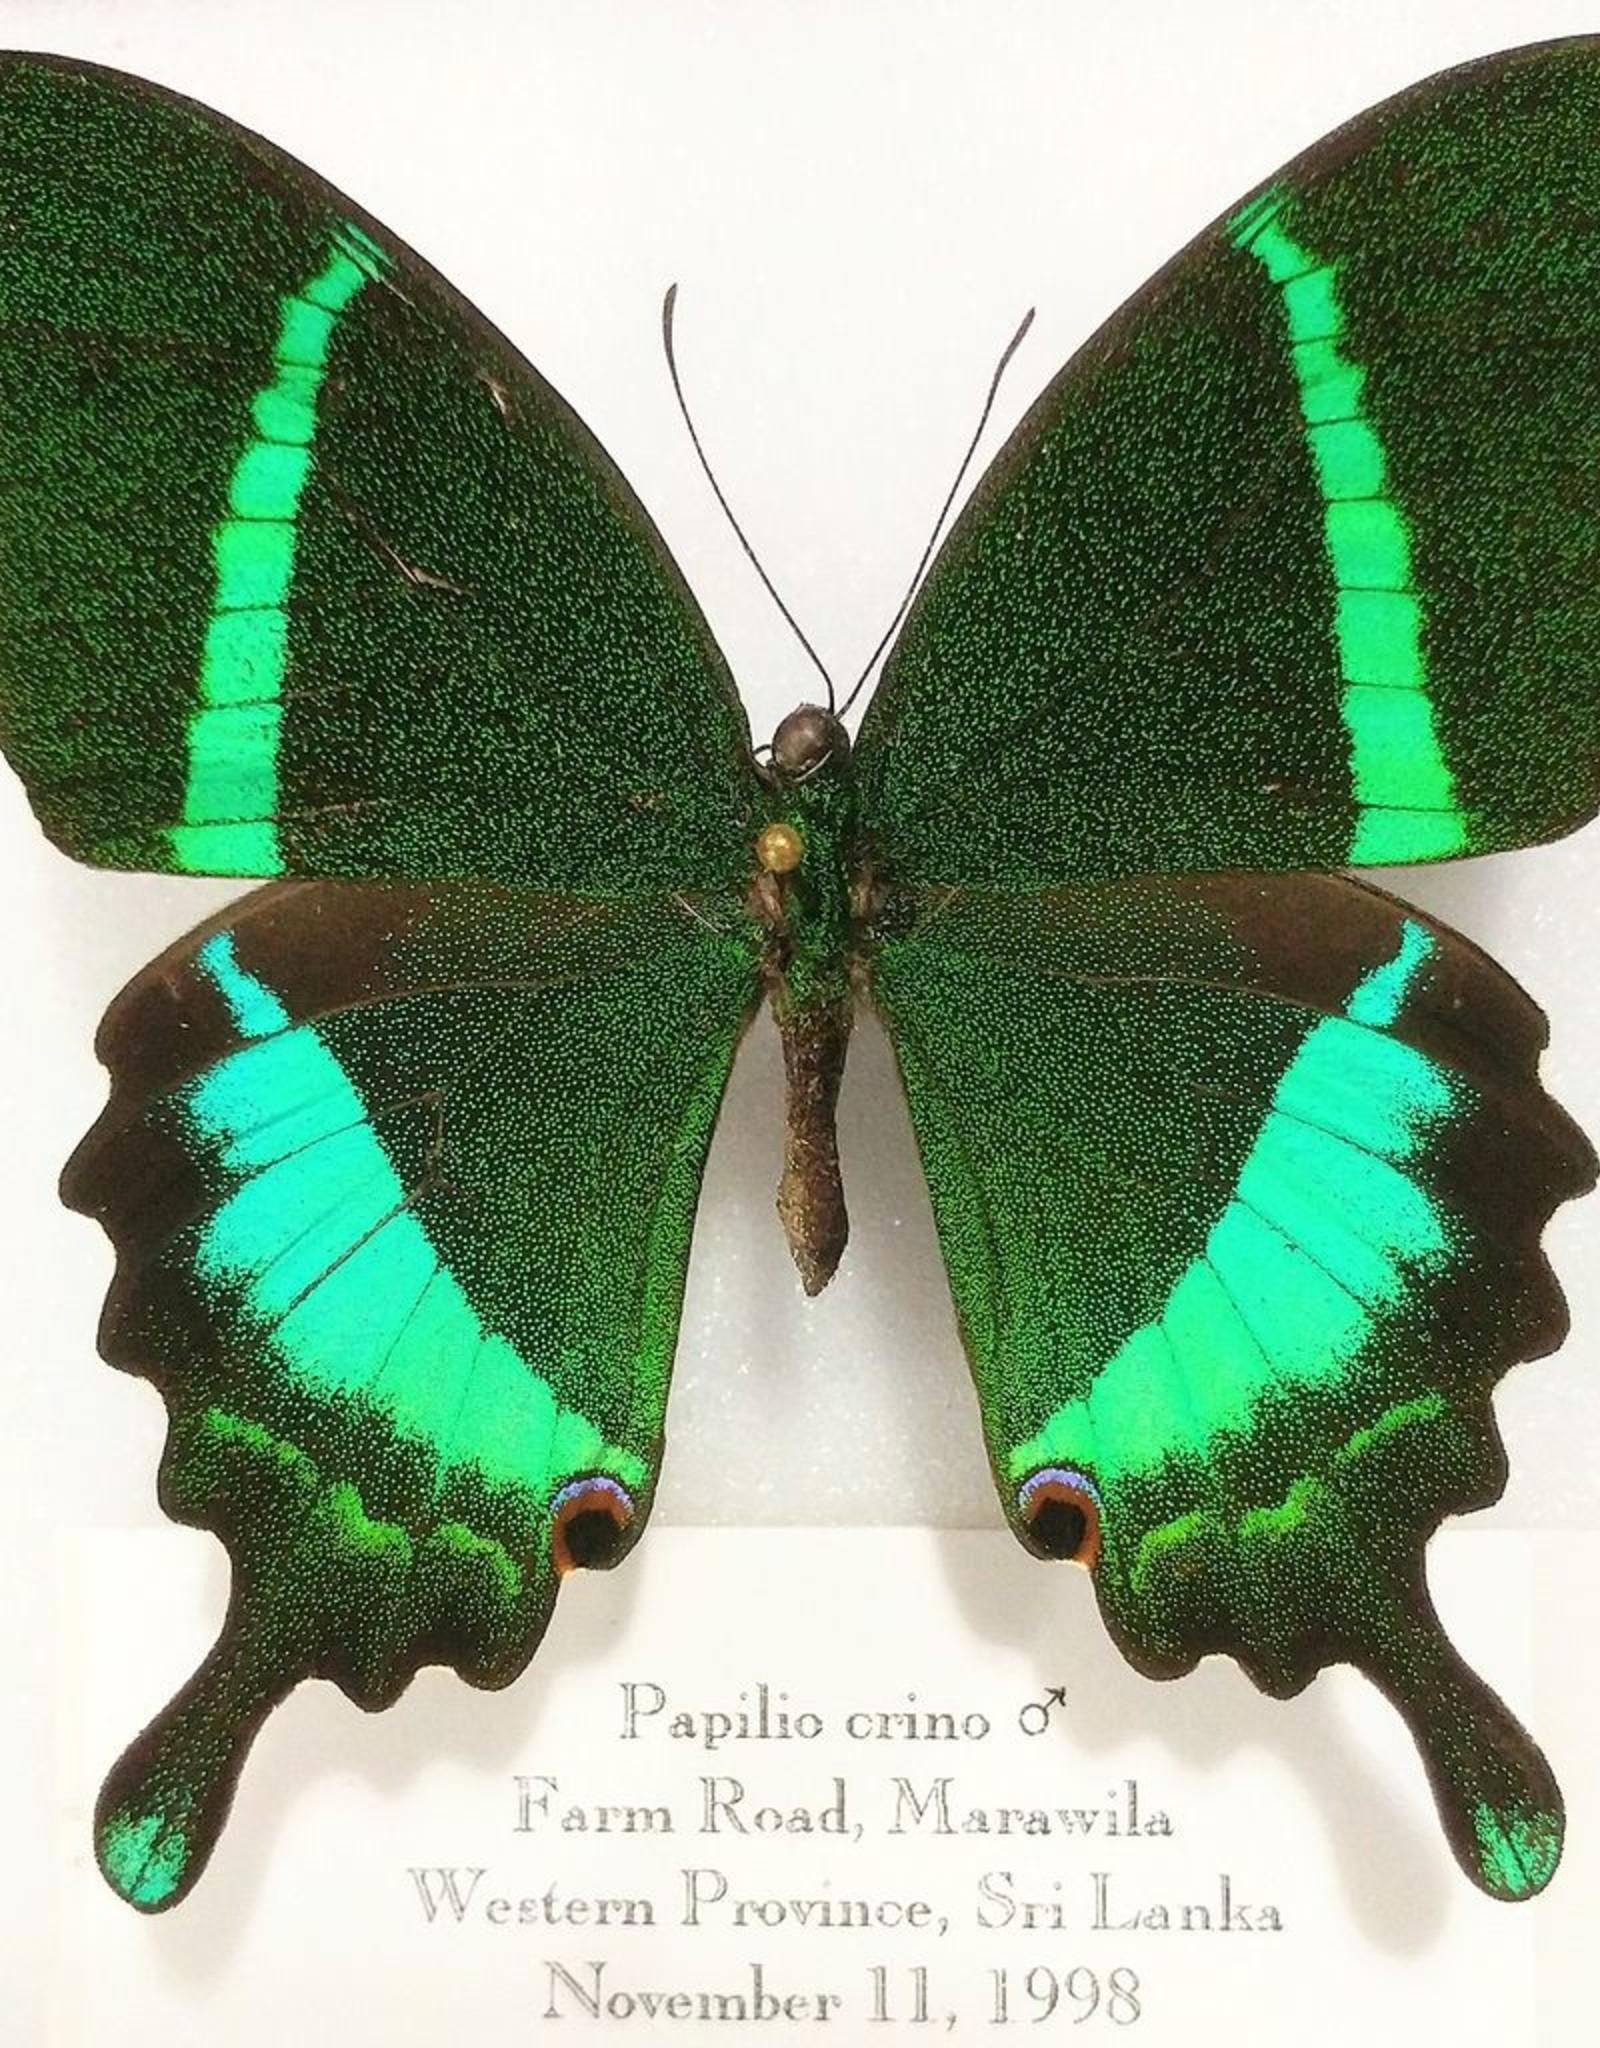 Papilio crino M A1- Sri Lanka